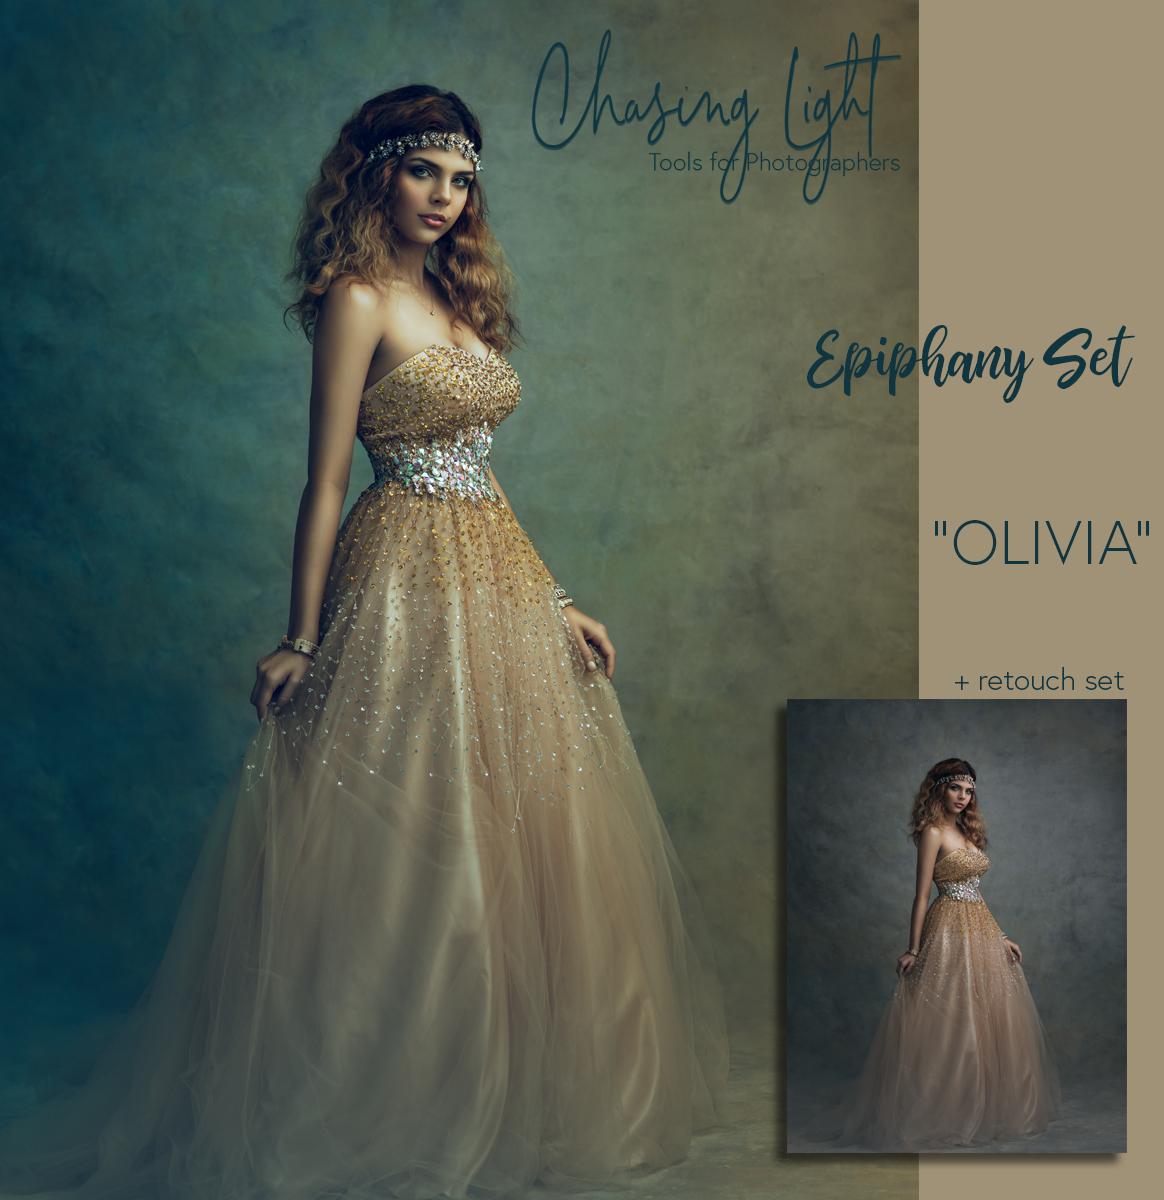 Epiphany-Olivia.jpg